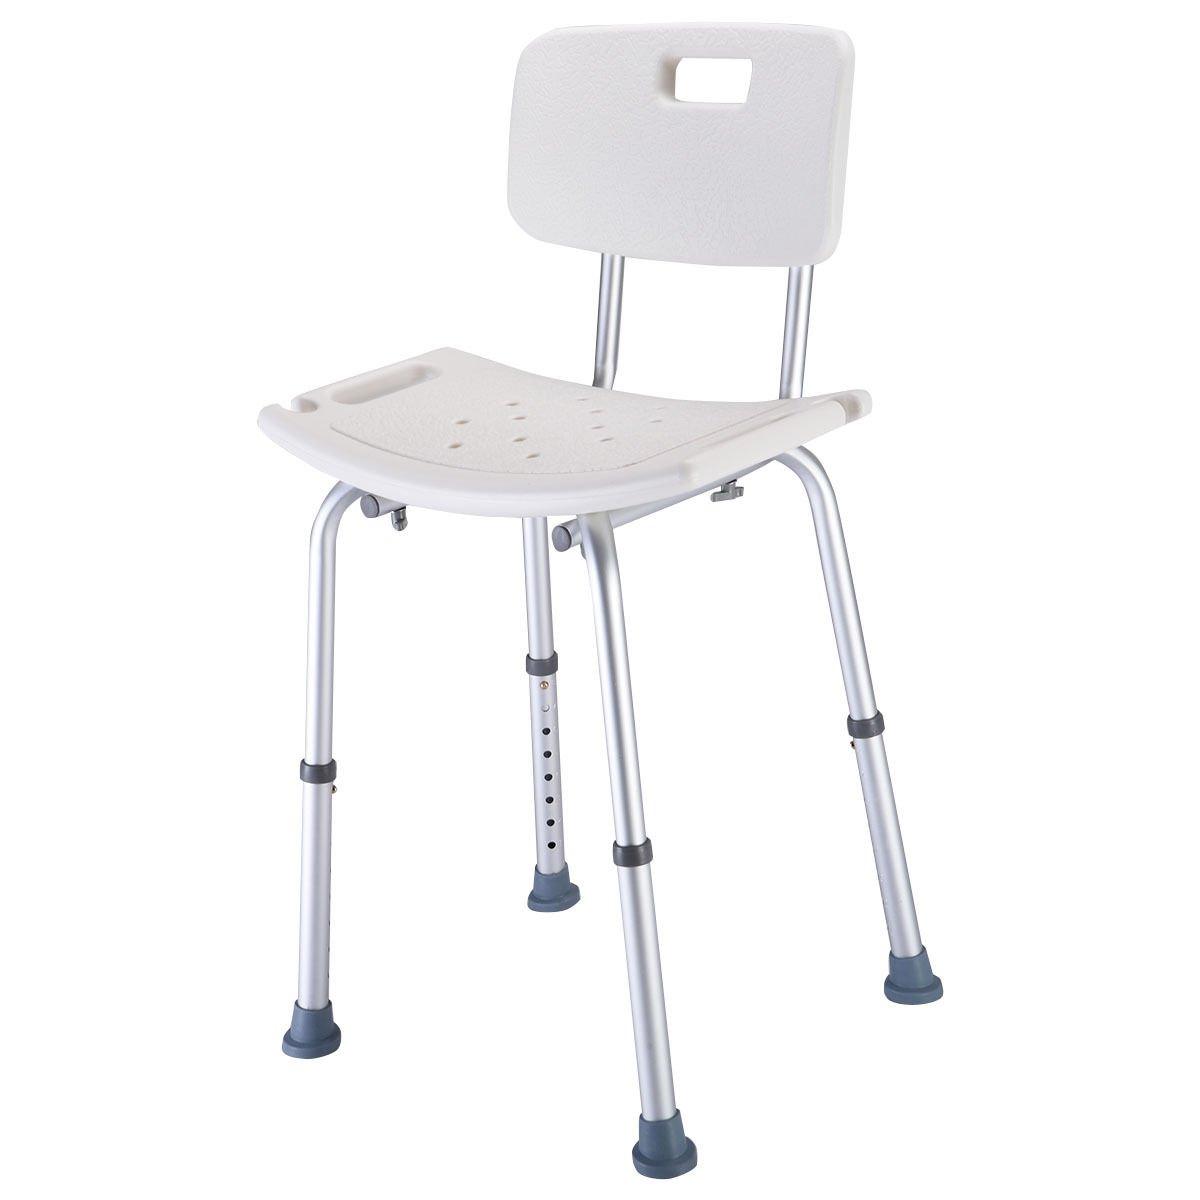 Shower Bath Chair 8 Height Adjustable Medical Stool Detachable Backrest